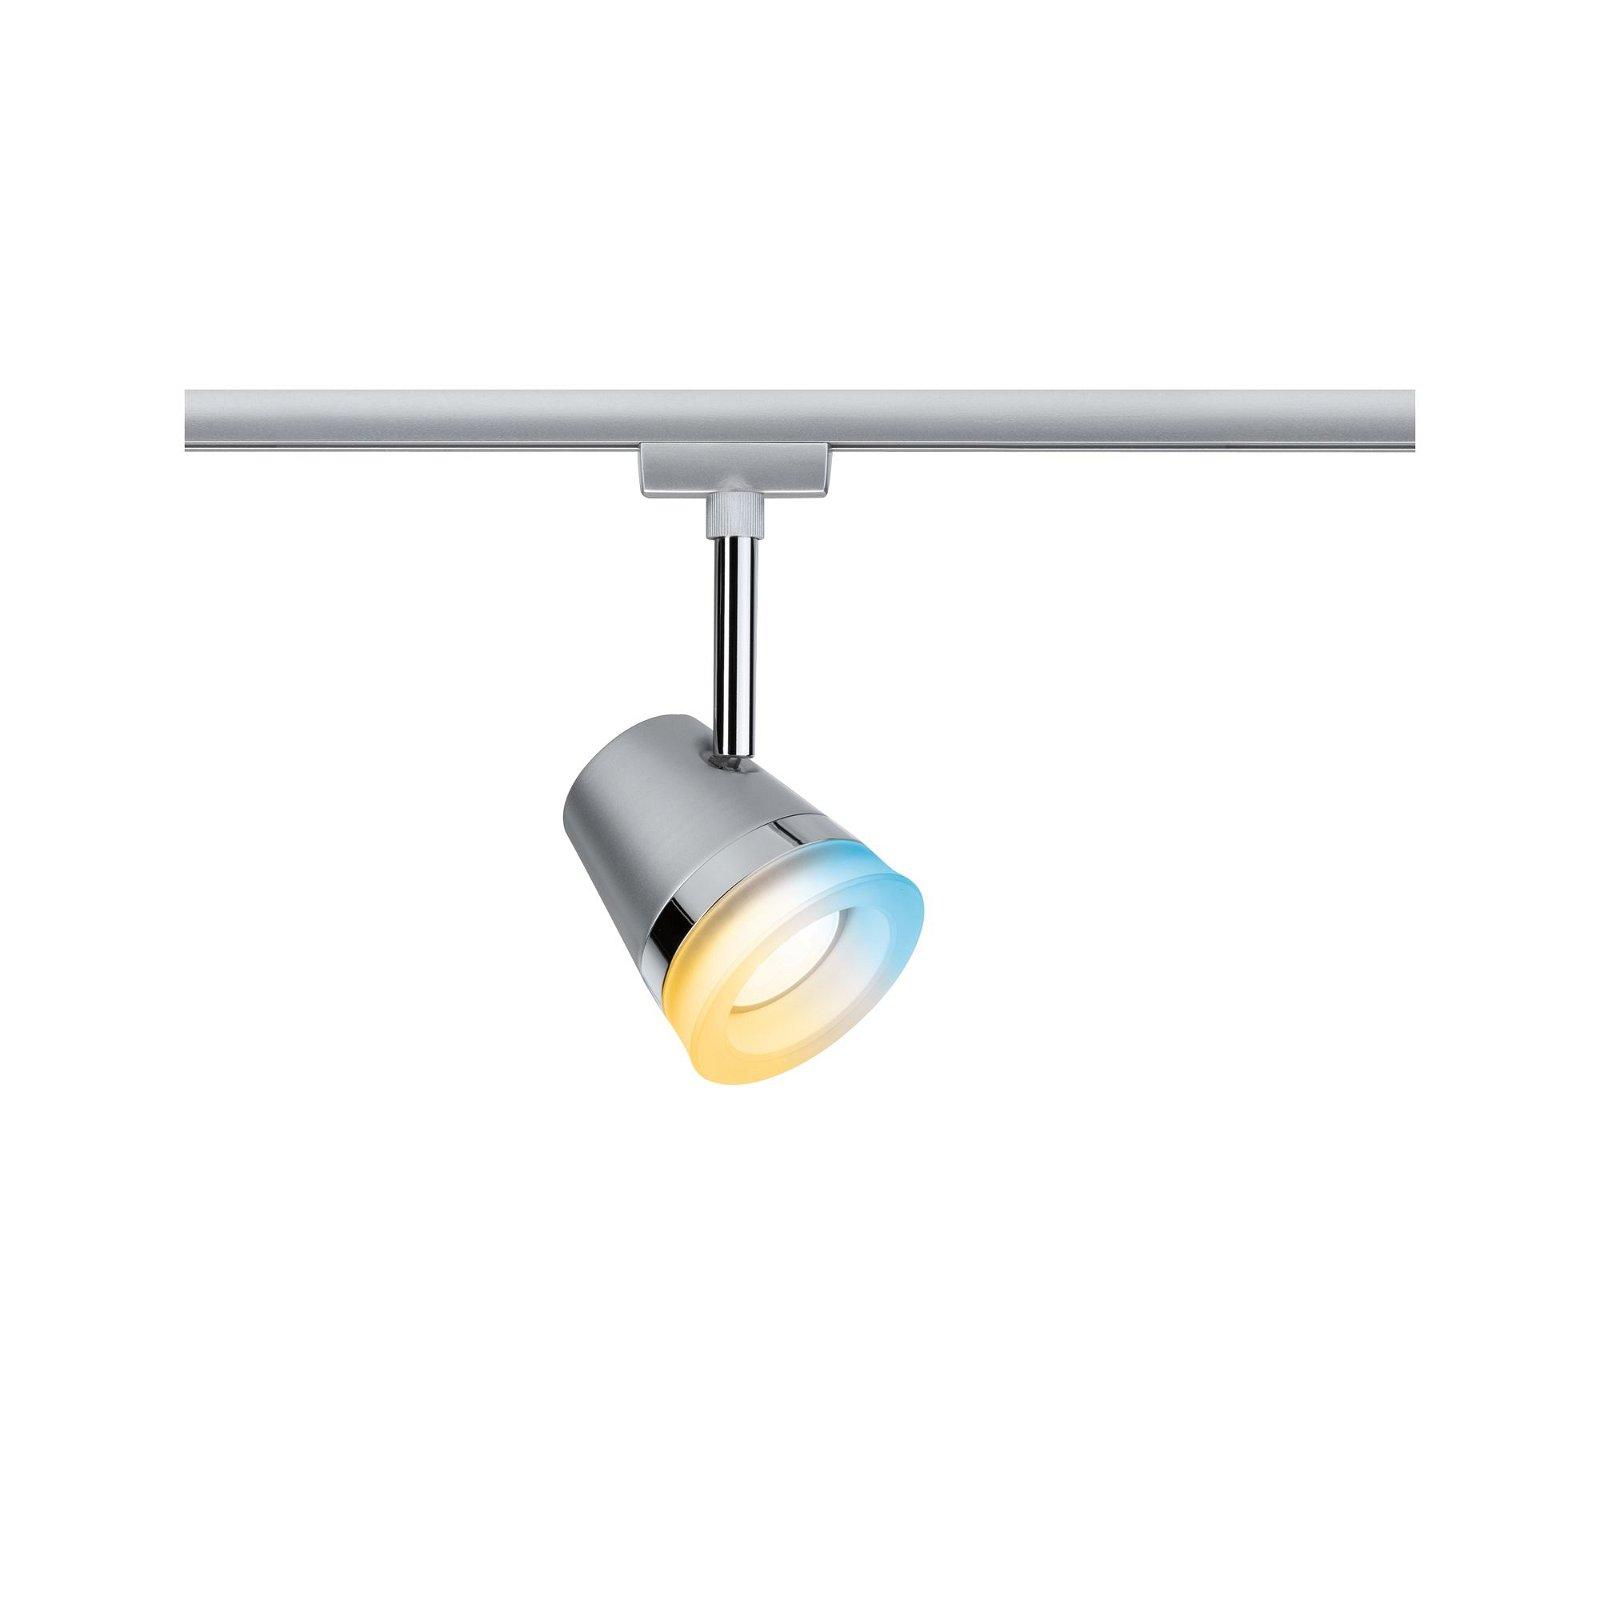 URail Schienenspot Smart Home Zigbee Cone inkl. Tunable White Leuchtmittel GU10 330lm 5W 2700 - 6500K 230V Chrom matt/Chrom